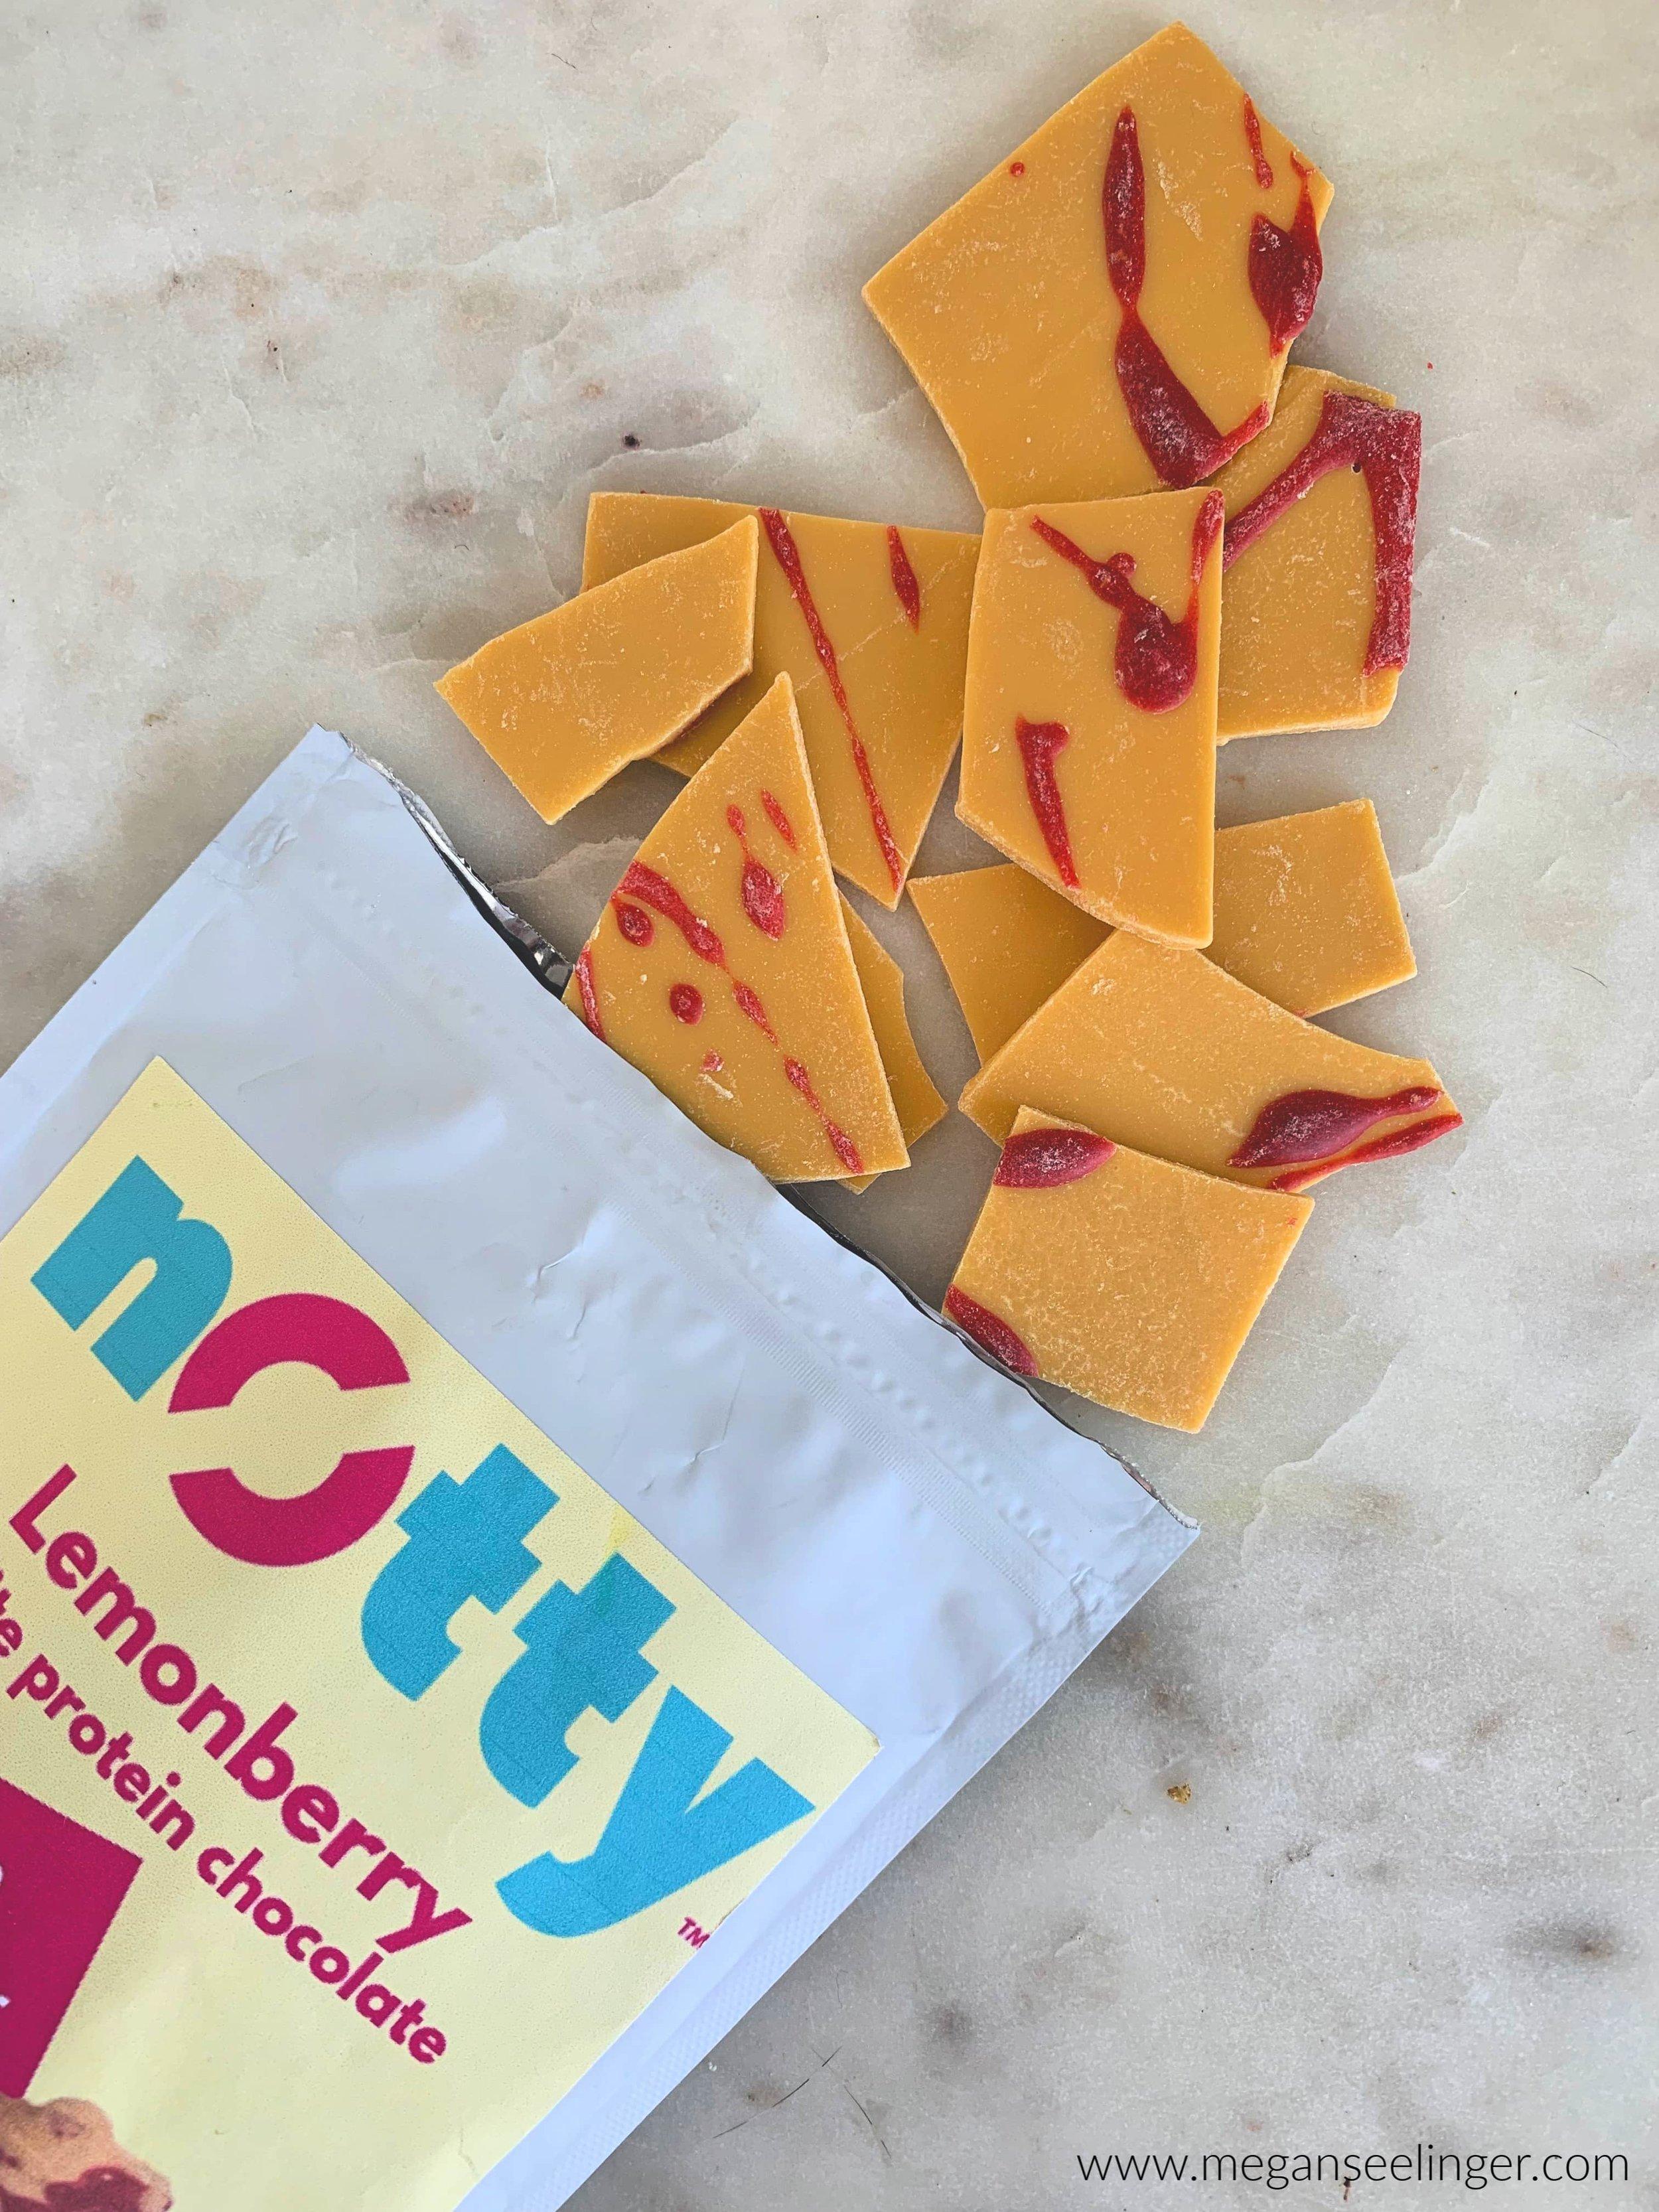 keto snacks you can buy